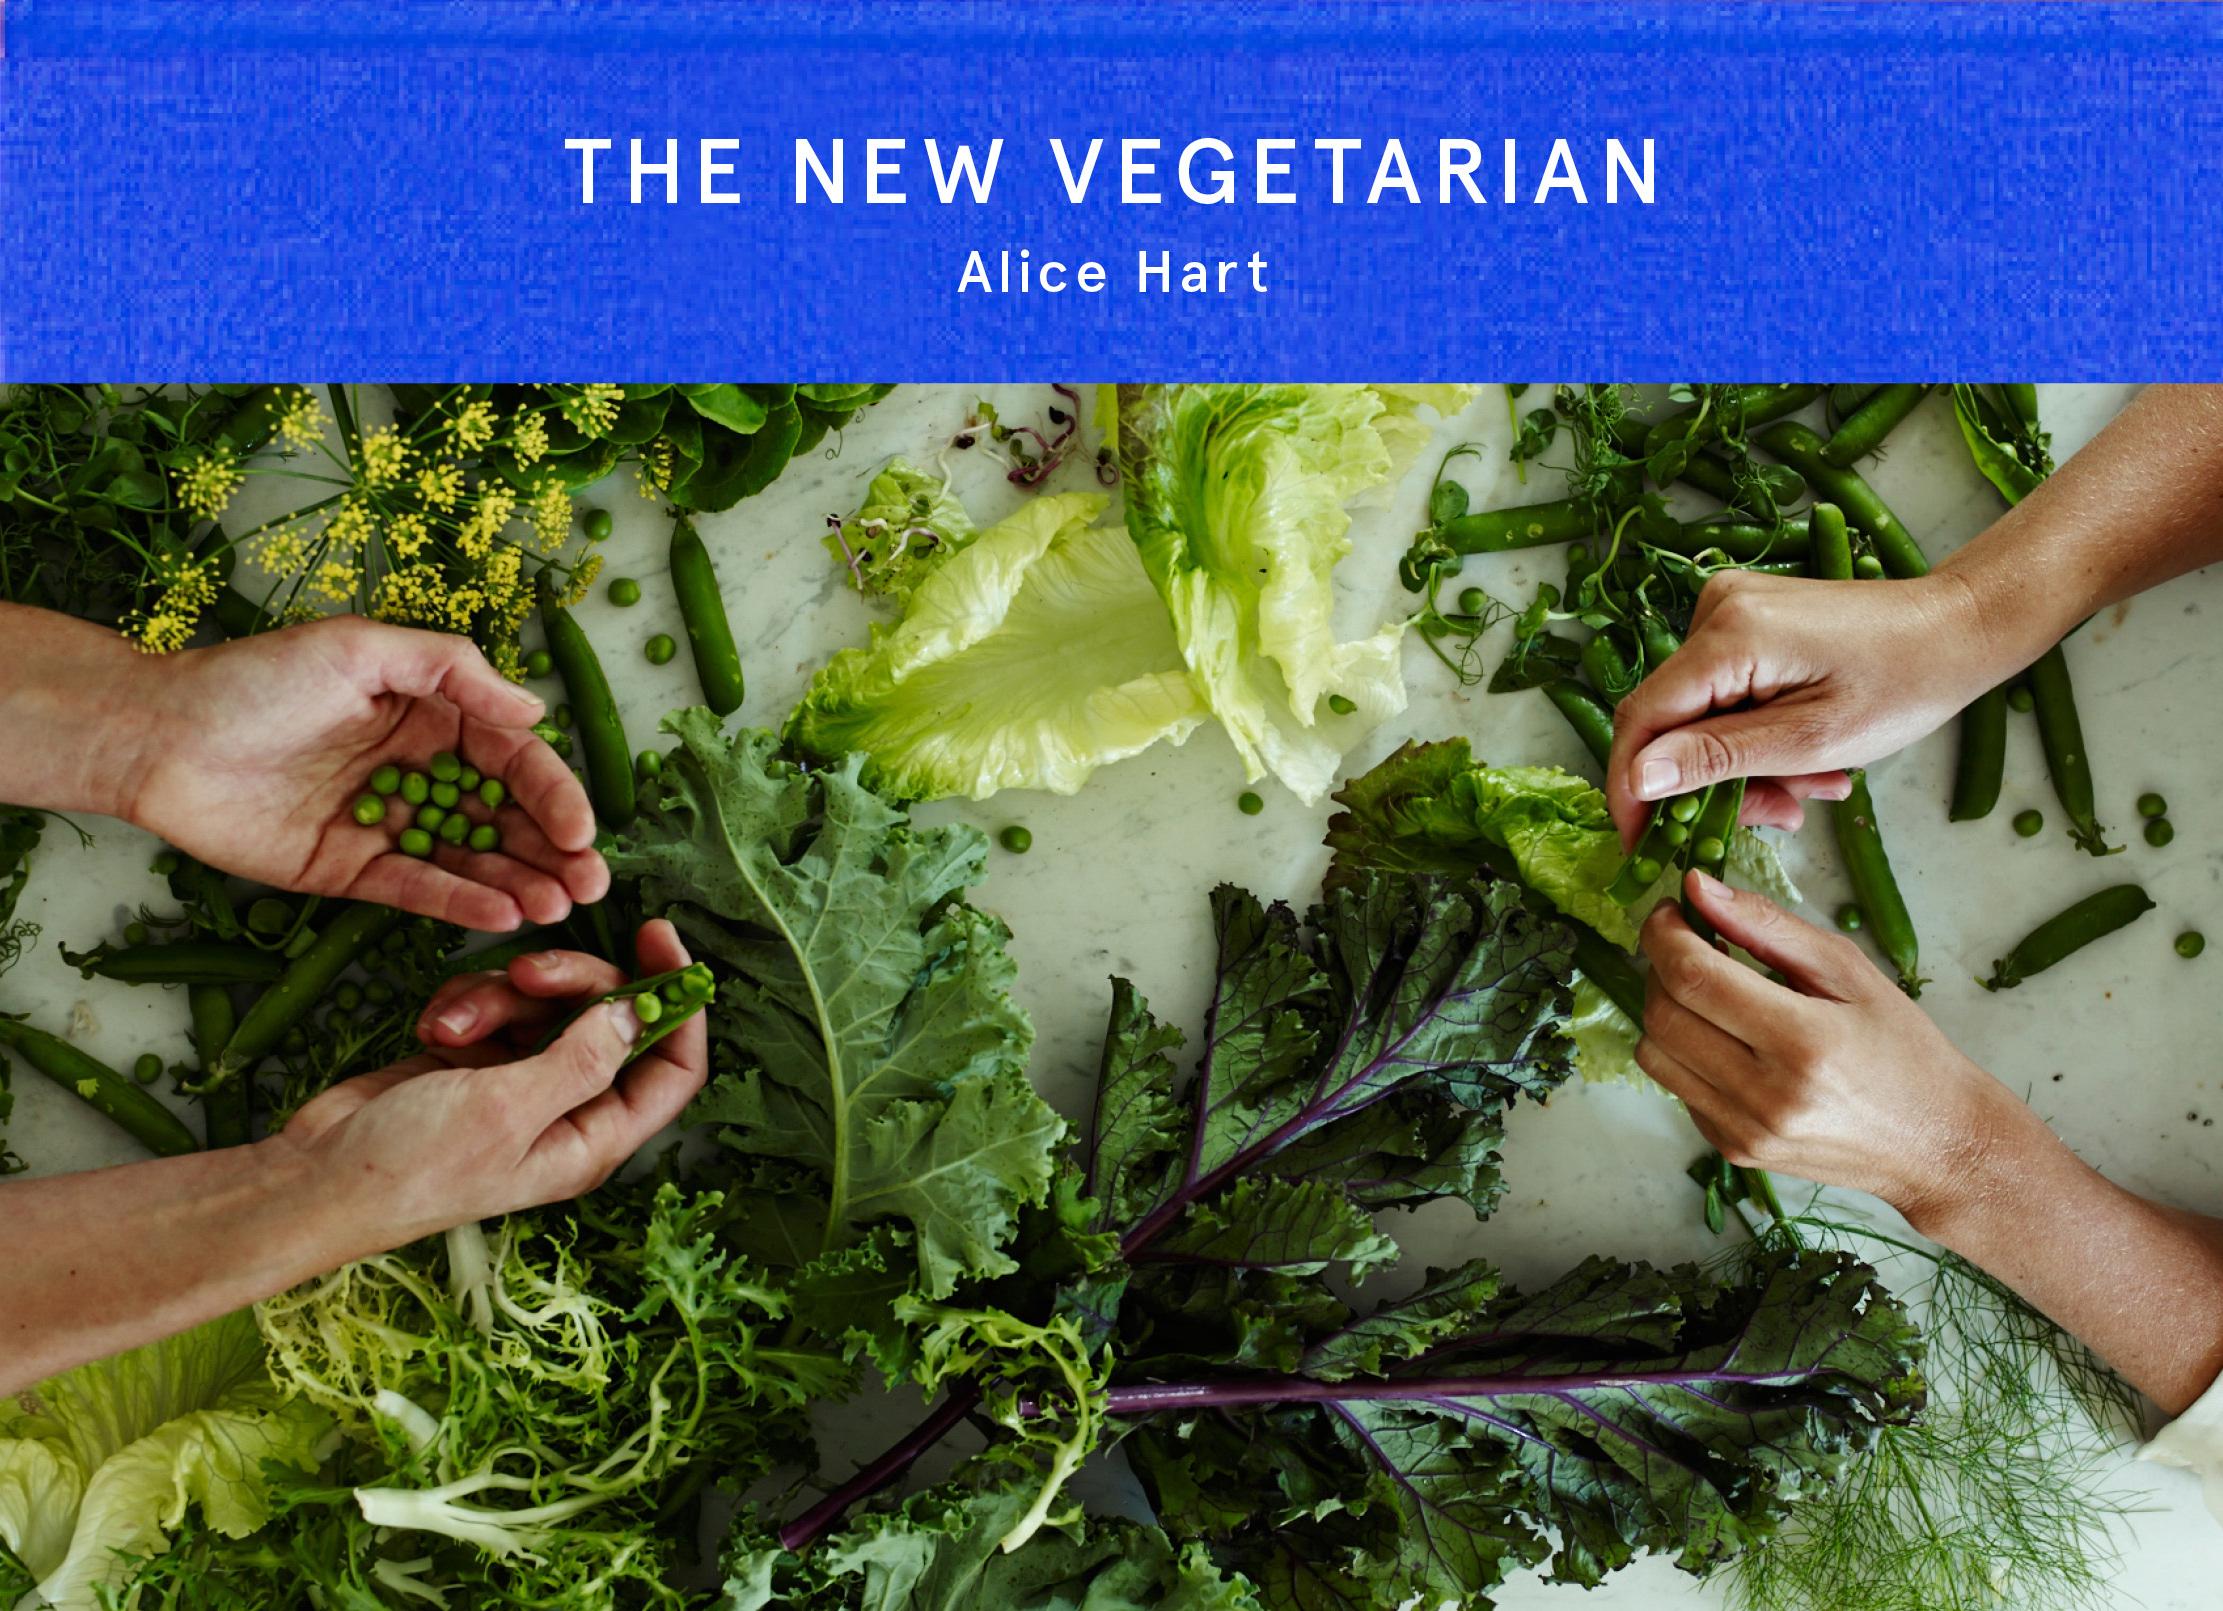 Penne with Asparagus Pesto & White Beans - by Alice Hart fromThe New Vegetarian (Square Peg / Penguin Random House)